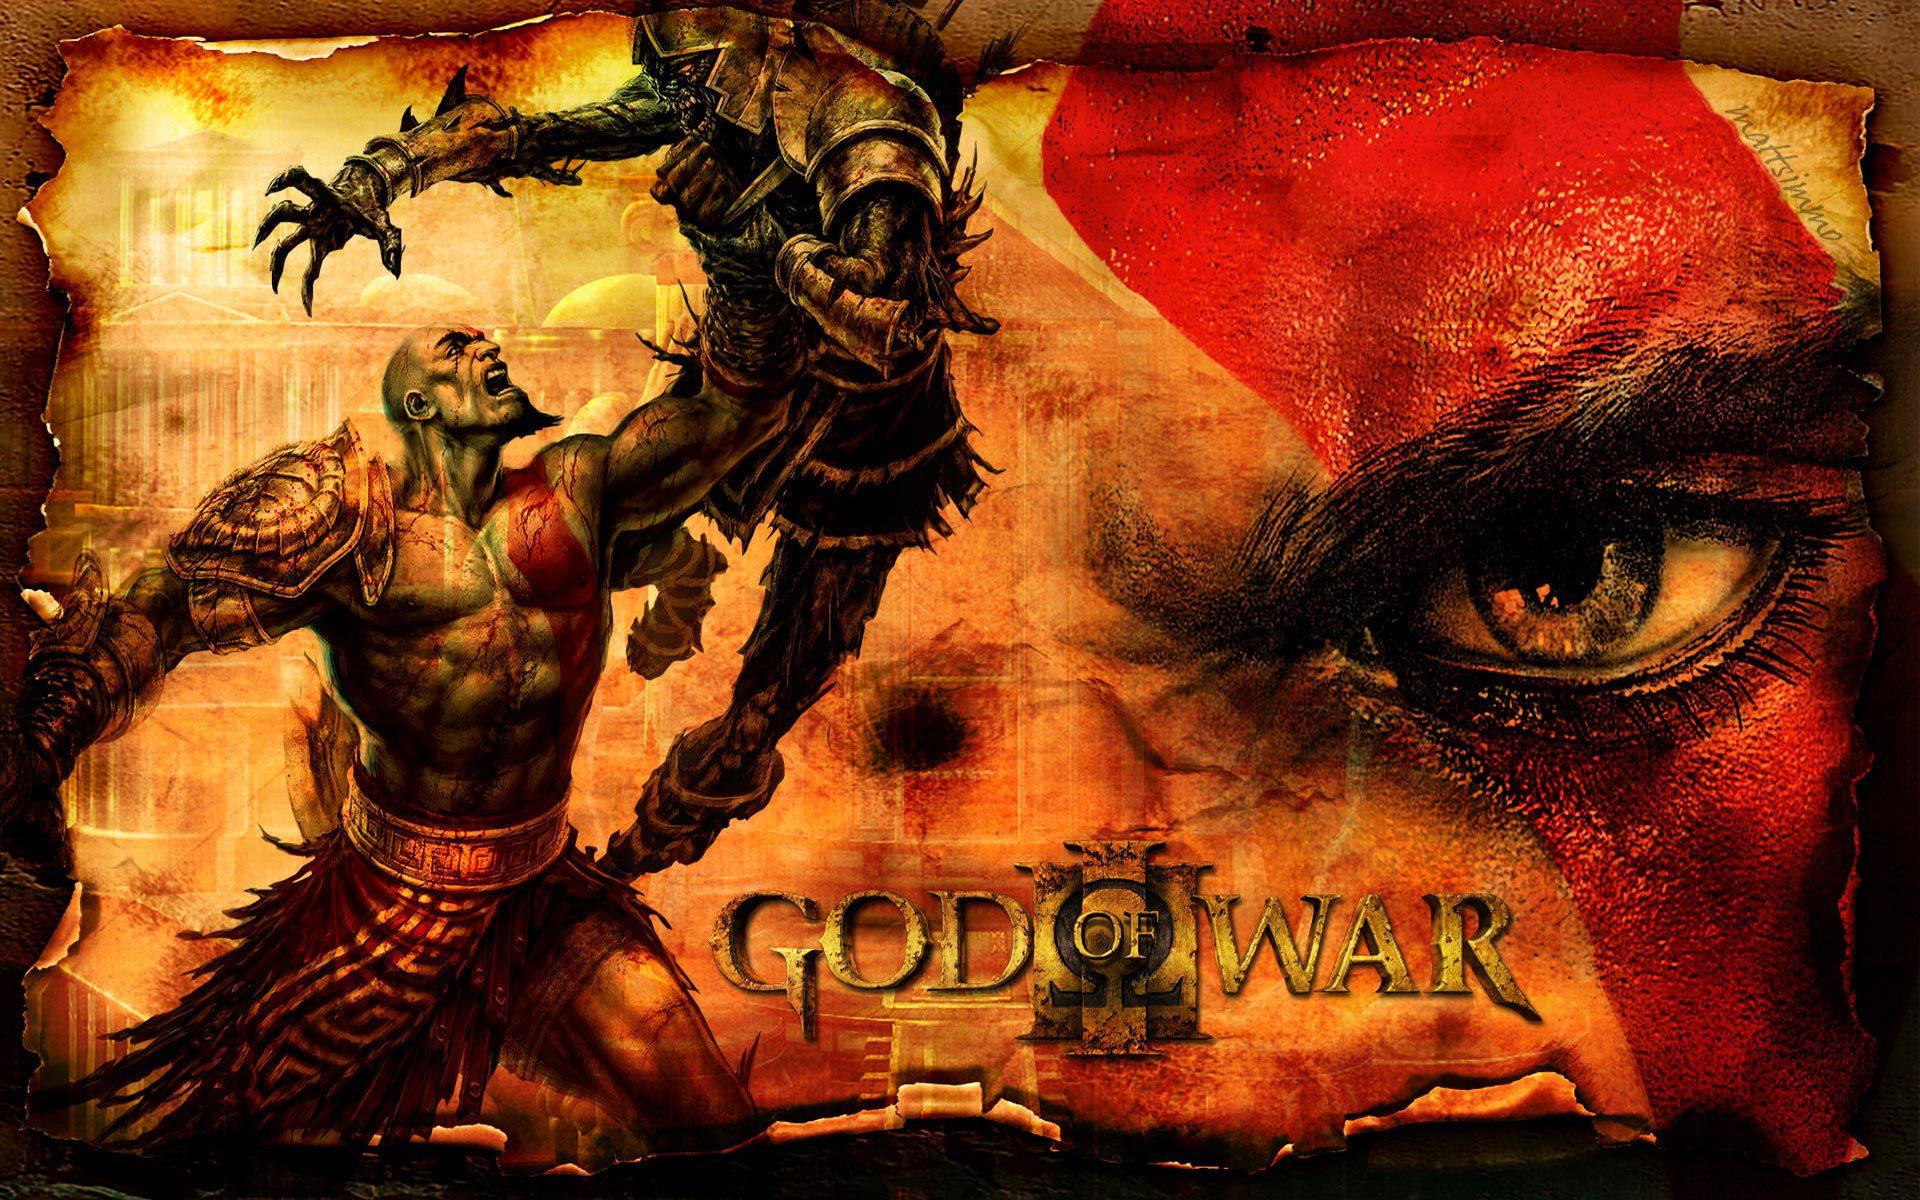 God of war ascension widescreen wallpaper hd wallpapers and god of war ascension widescreen wallpaper hd voltagebd Gallery